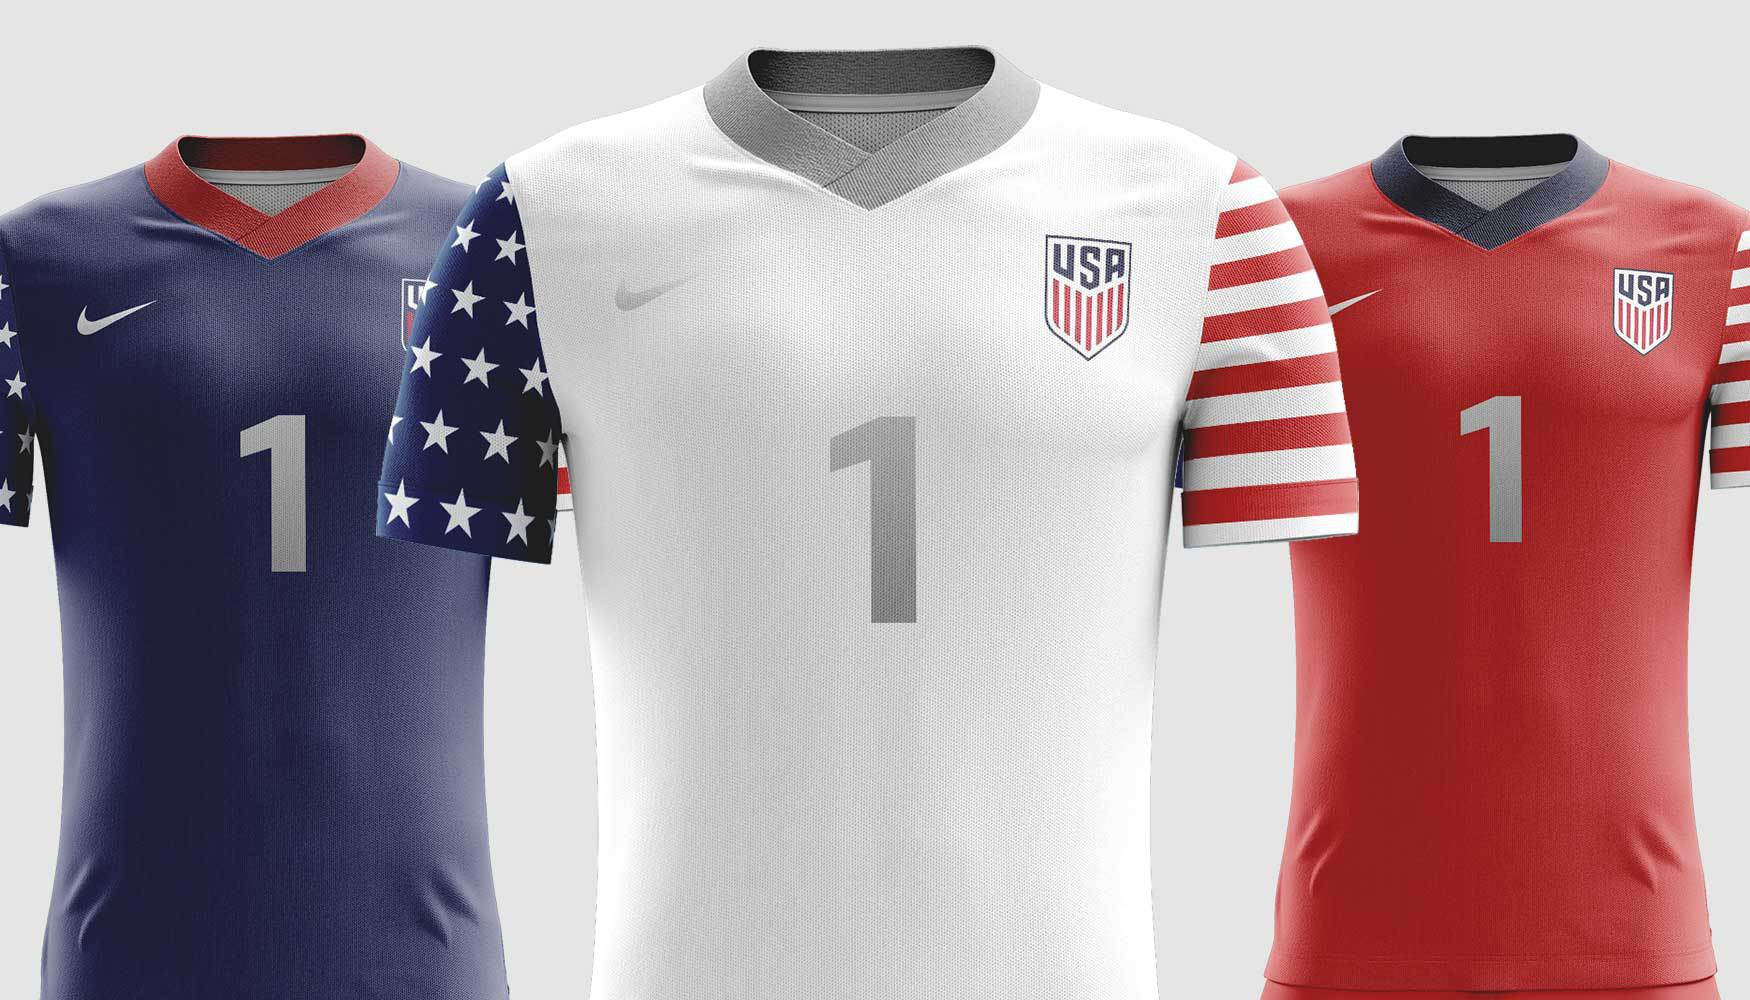 3b3634ca2 Dribbble - team-usa-nike-soccer-jersey-concept-designs.jpg by Matt ...